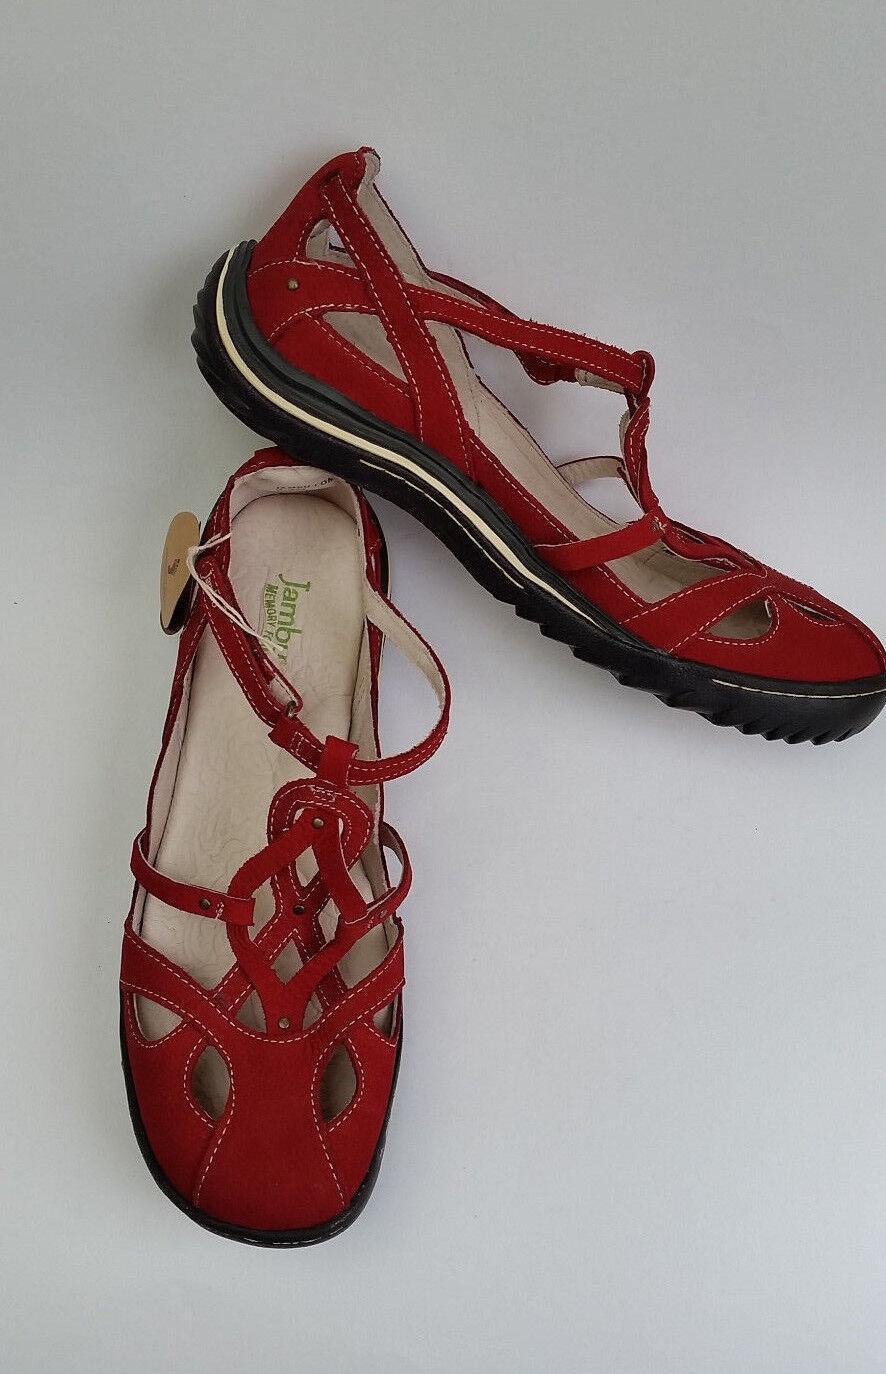 Jambu Shoes Flats SPAIN Red Crisscross Design Comfort Donna NWT Size 9.5 M